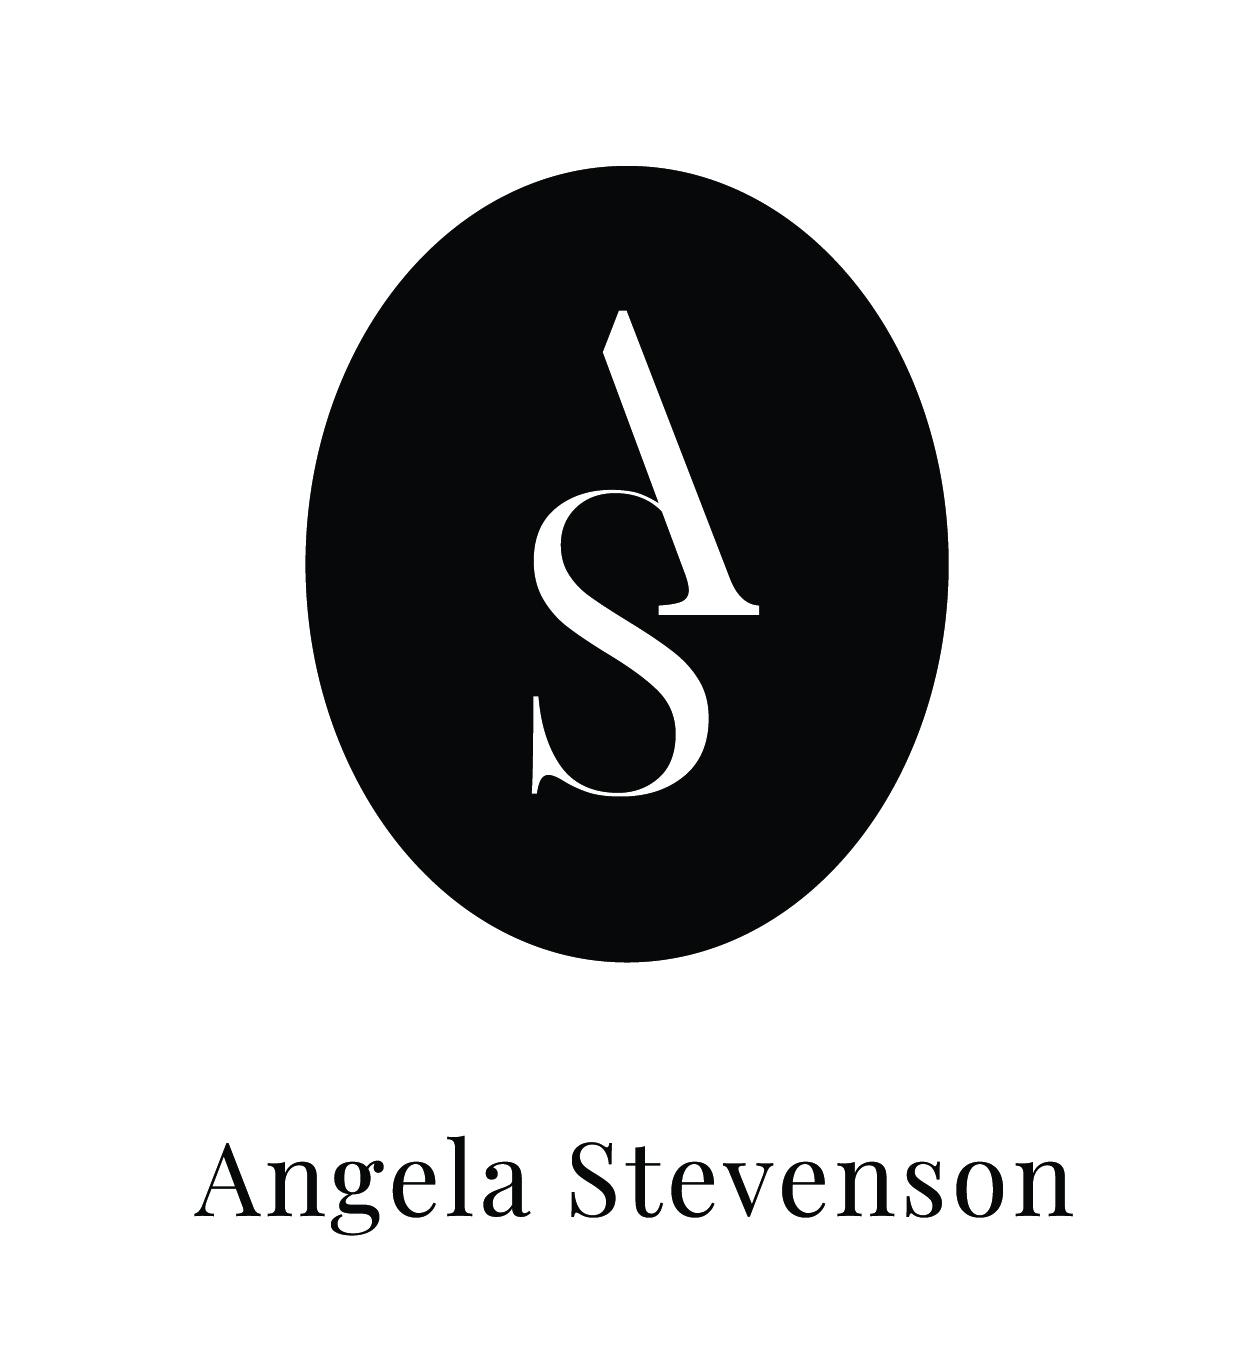 2018 07 AS Logo Final Source Files-02.jpg